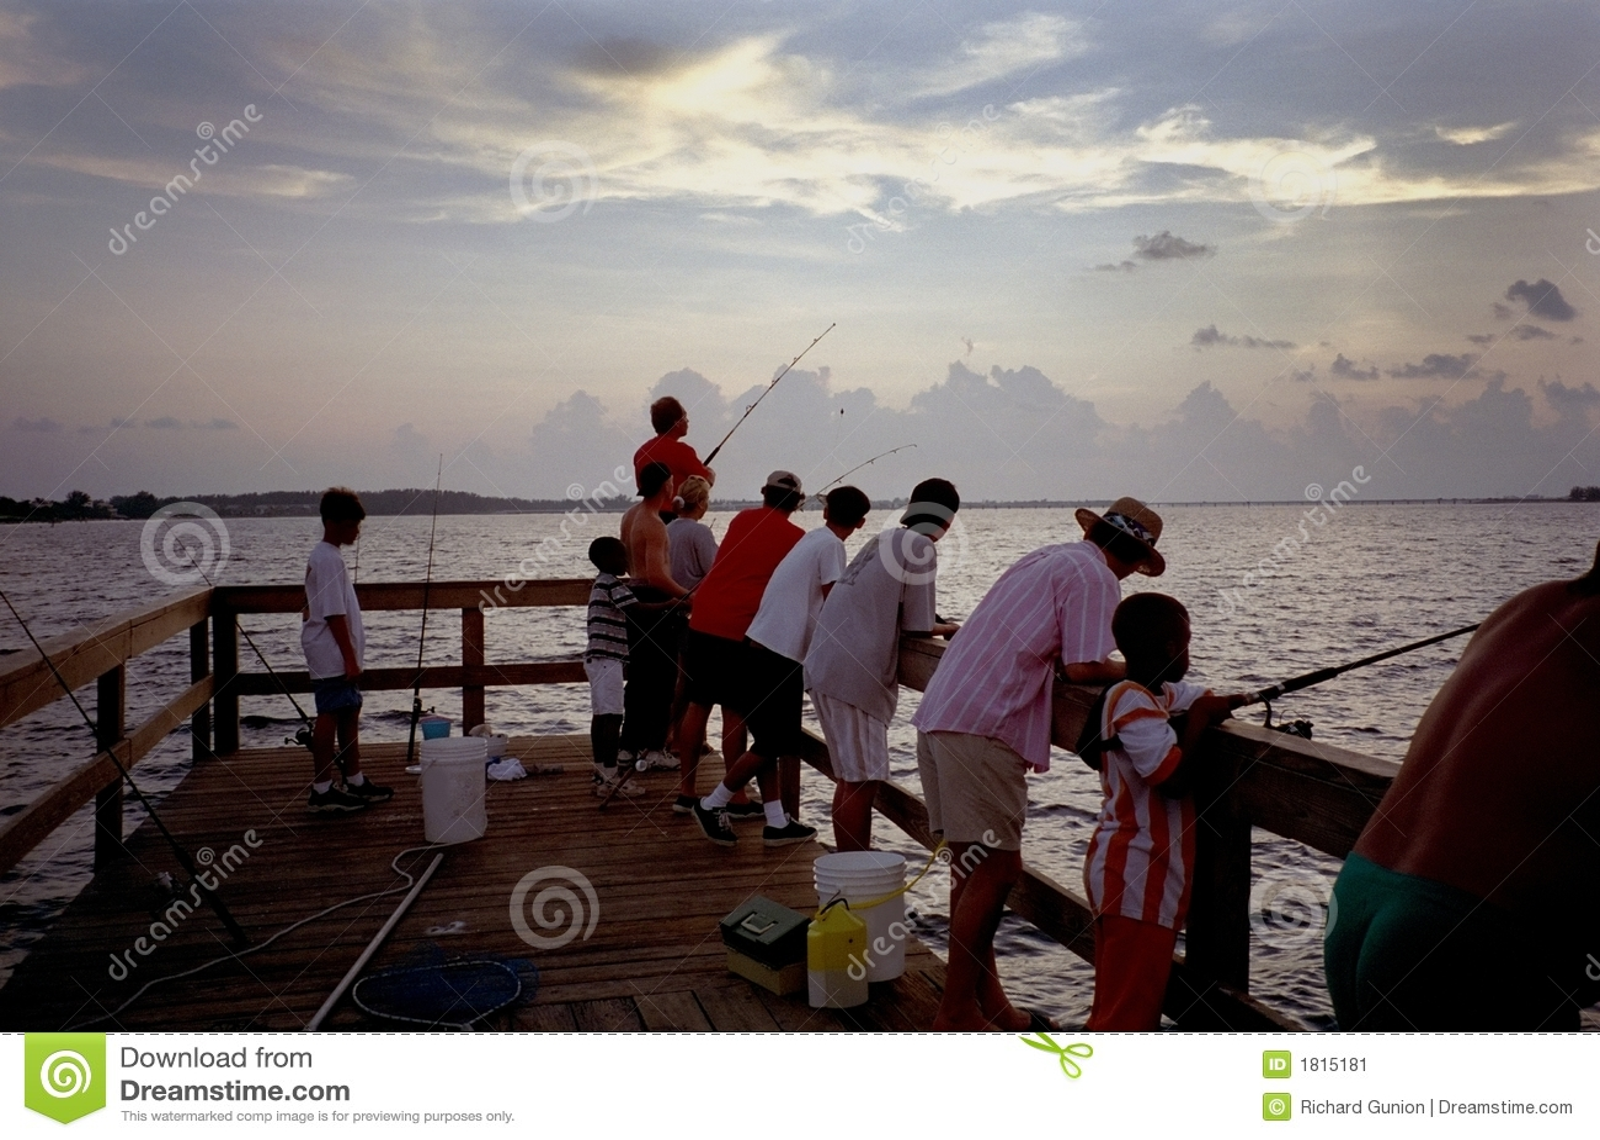 Sanibel island fishing pier stock image image 1815181 for Sanibel fishing pier